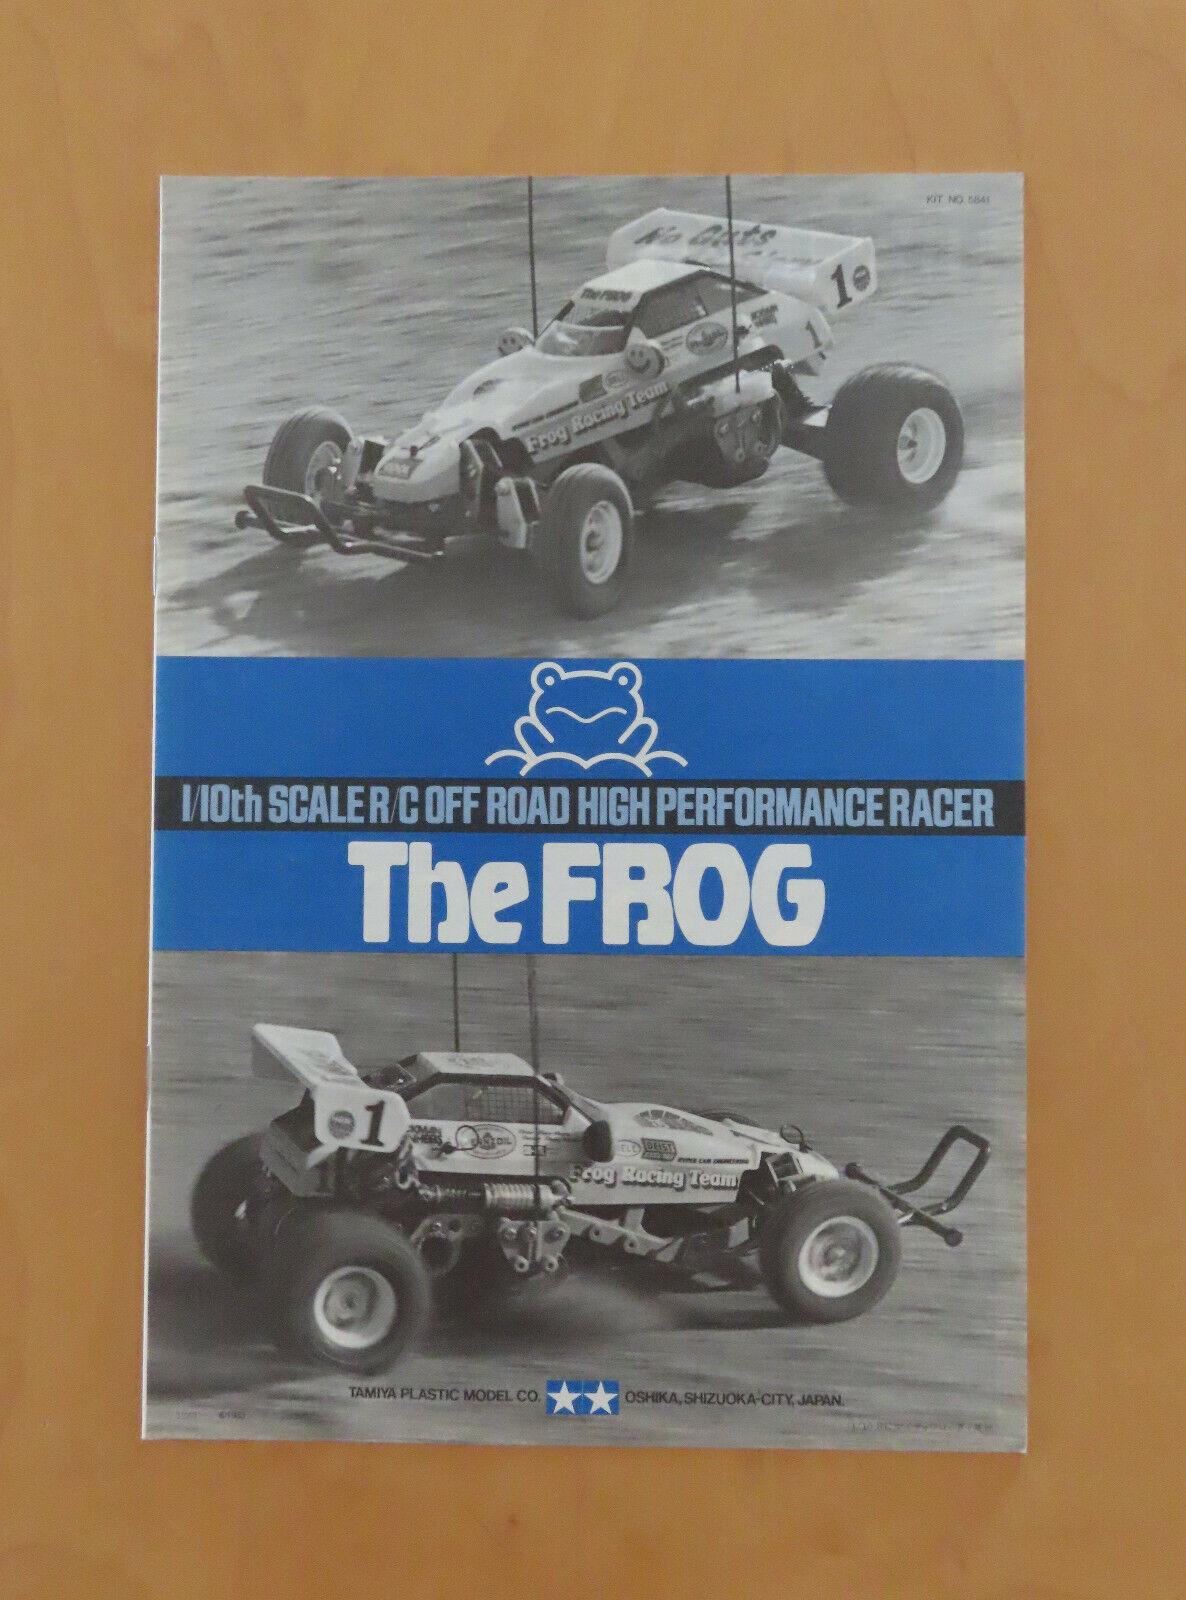 RC Tamiya MANUALE The Frog 5841, 58041 NUOVO 1983